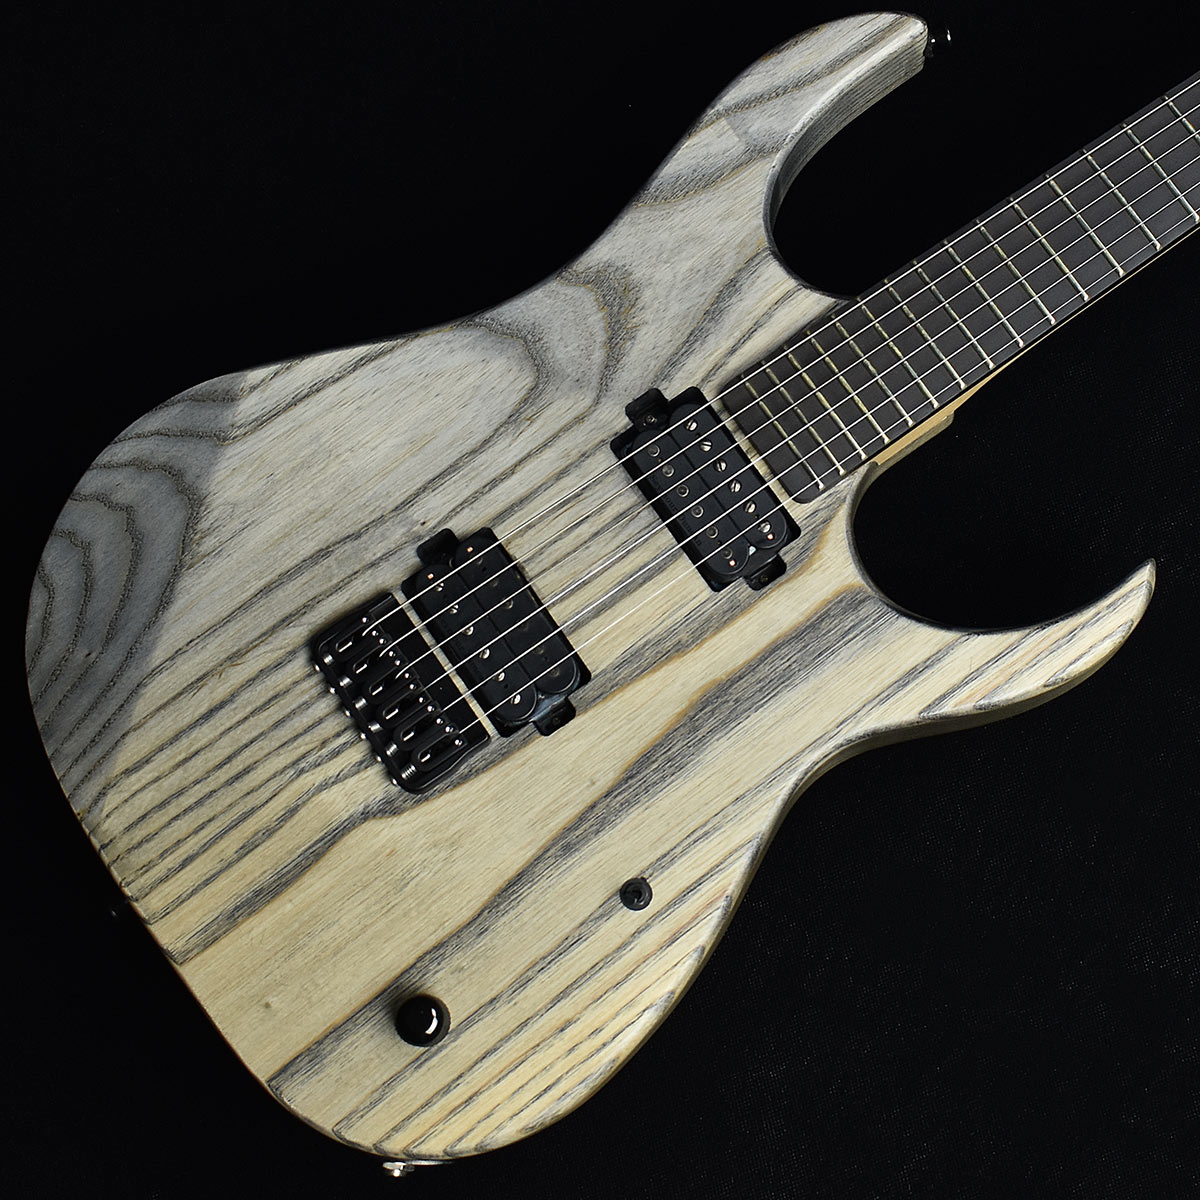 Strictly 7 Guitars Cobra Std6 HT/B 【ストリクトリー7ギターズ】【未展示品】